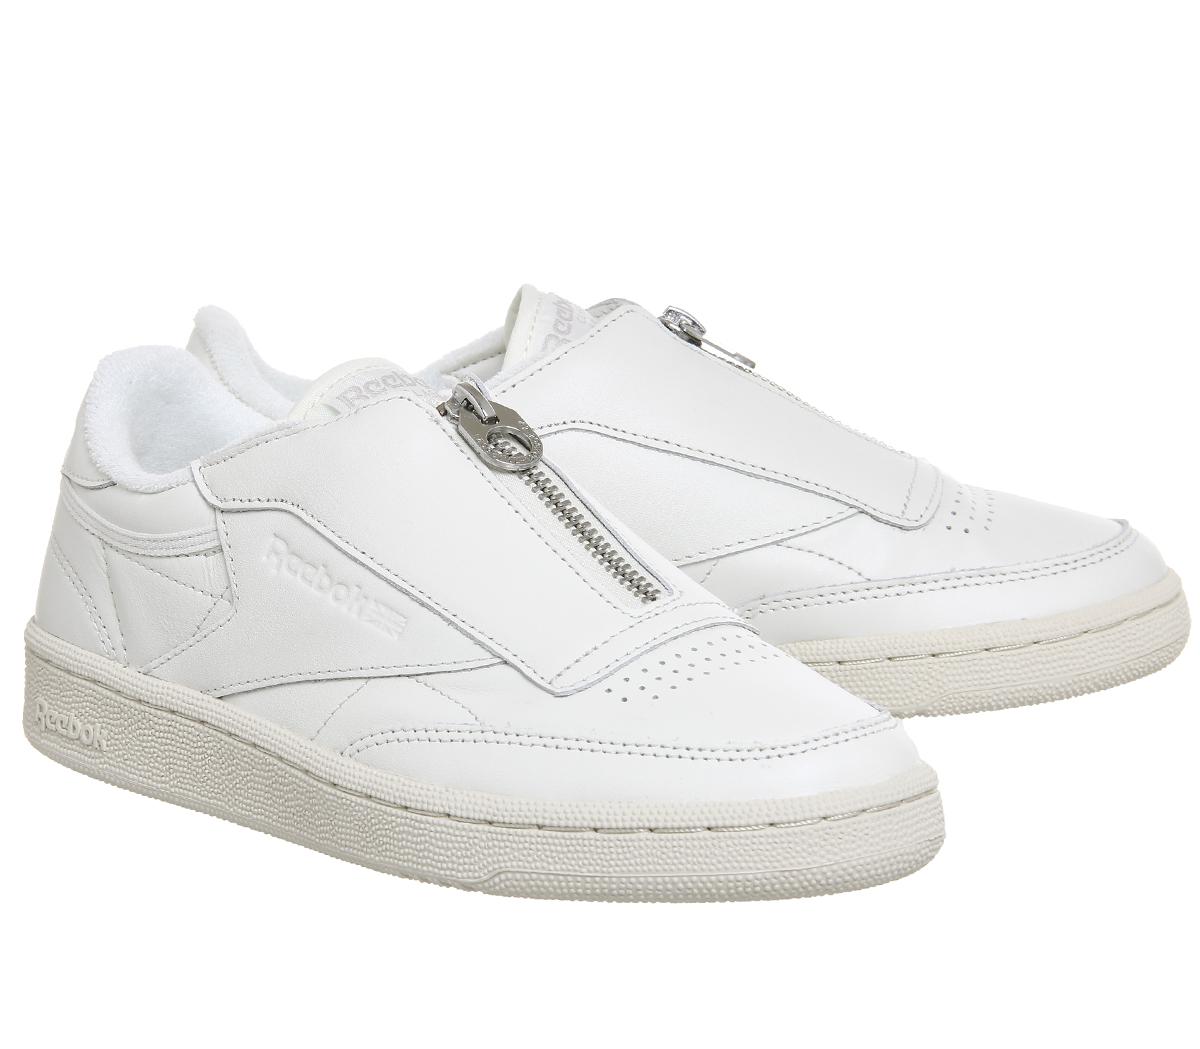 d3eec93fb130 Womens Reebok Club C 85 Zip Chalk Sandstone Trainers Shoes